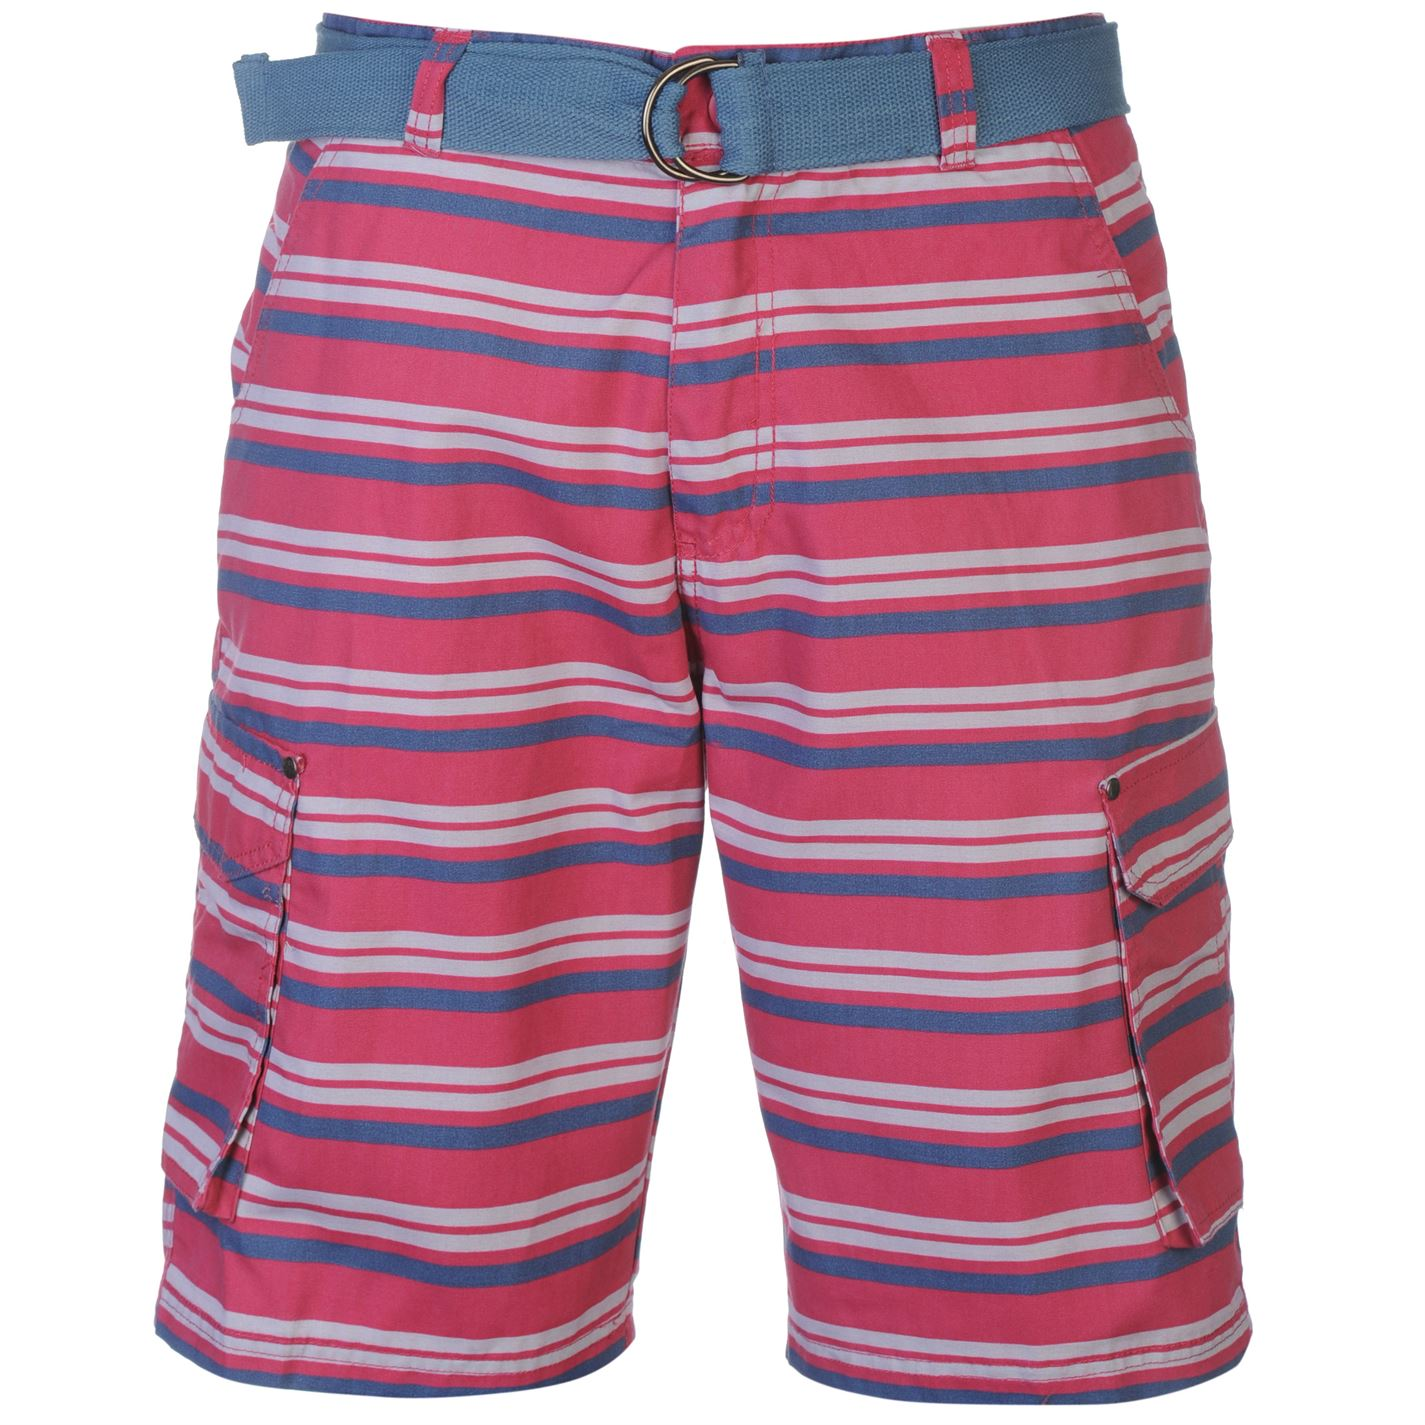 Barbati > Pantaloni